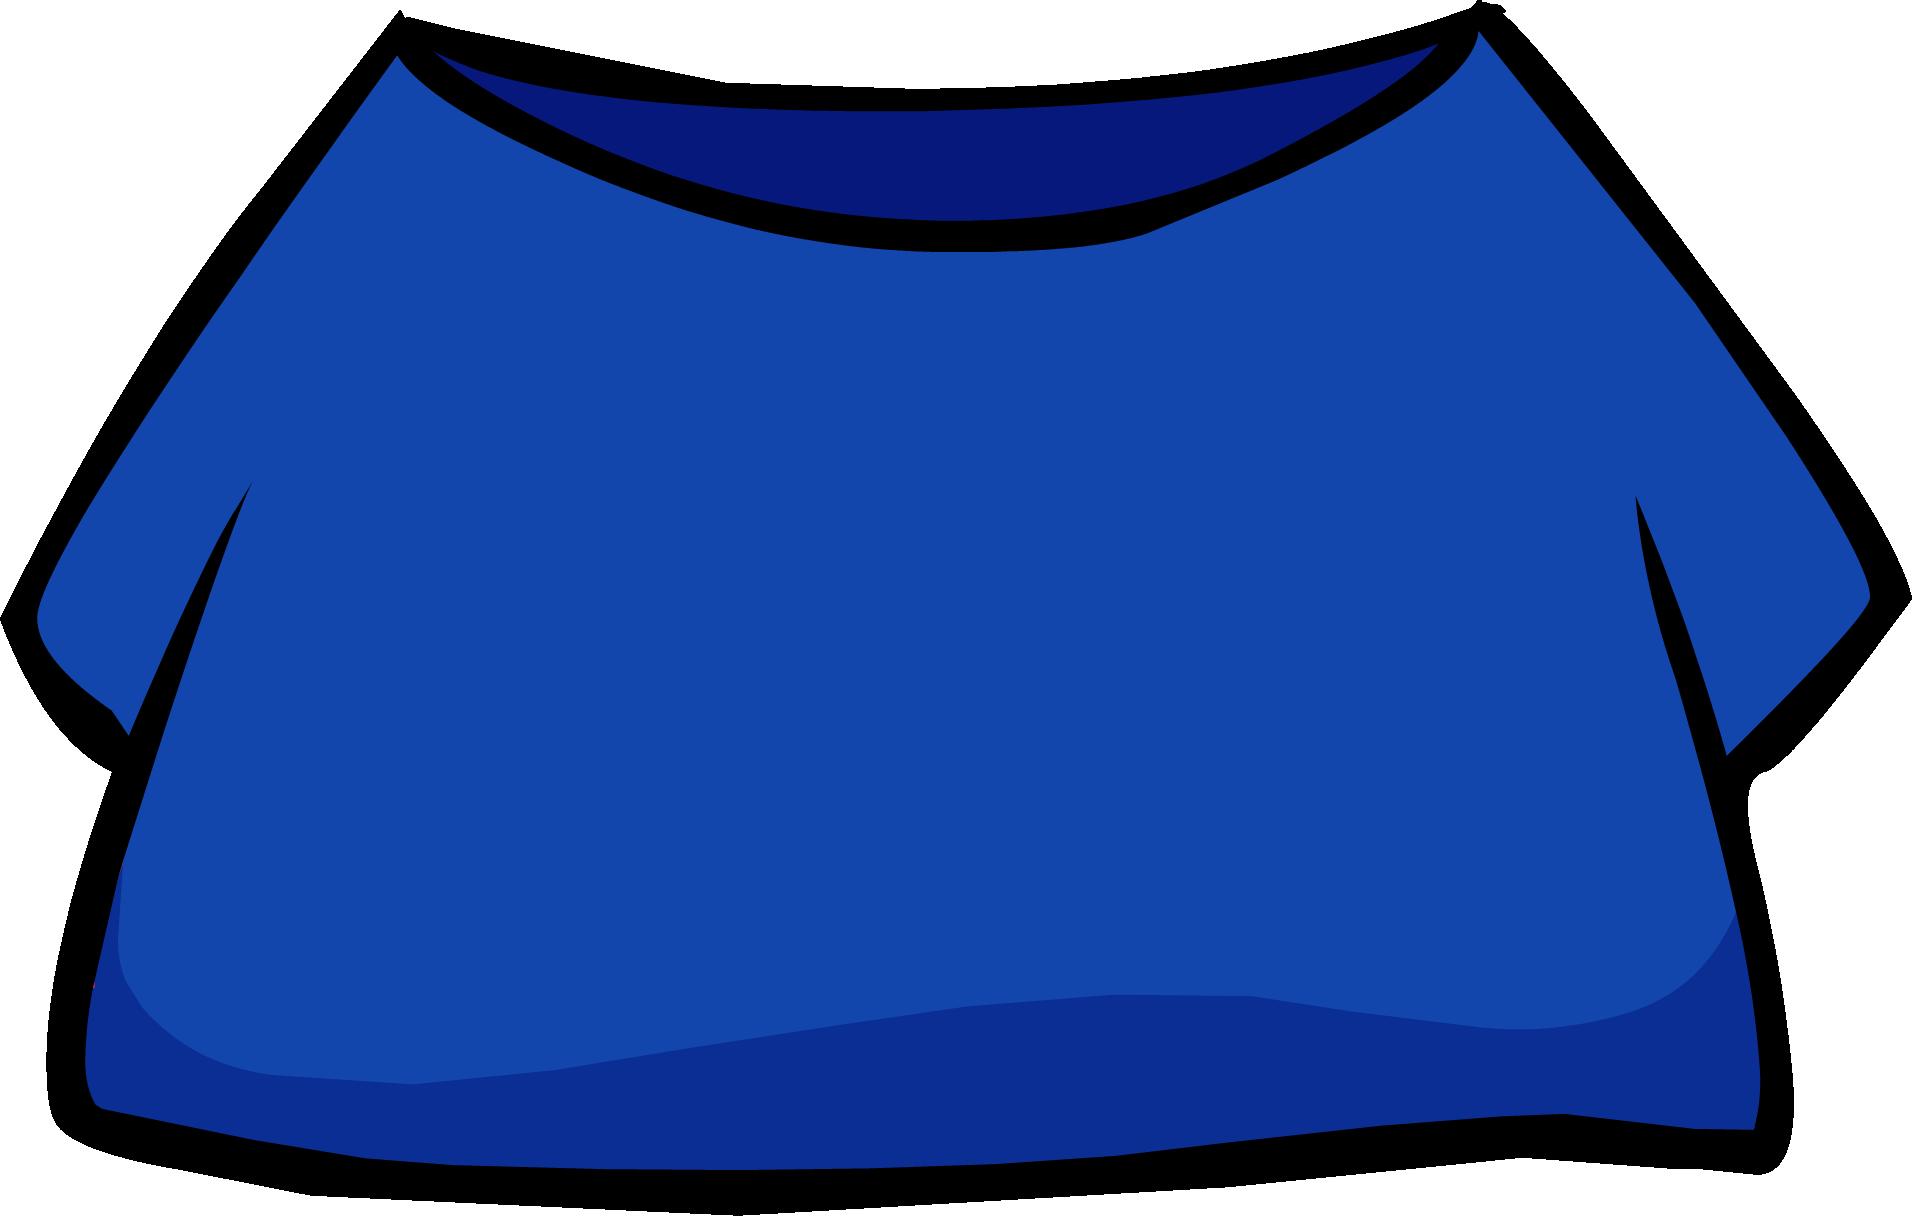 Clothing clipart clothing item. Blue shirt club penguin